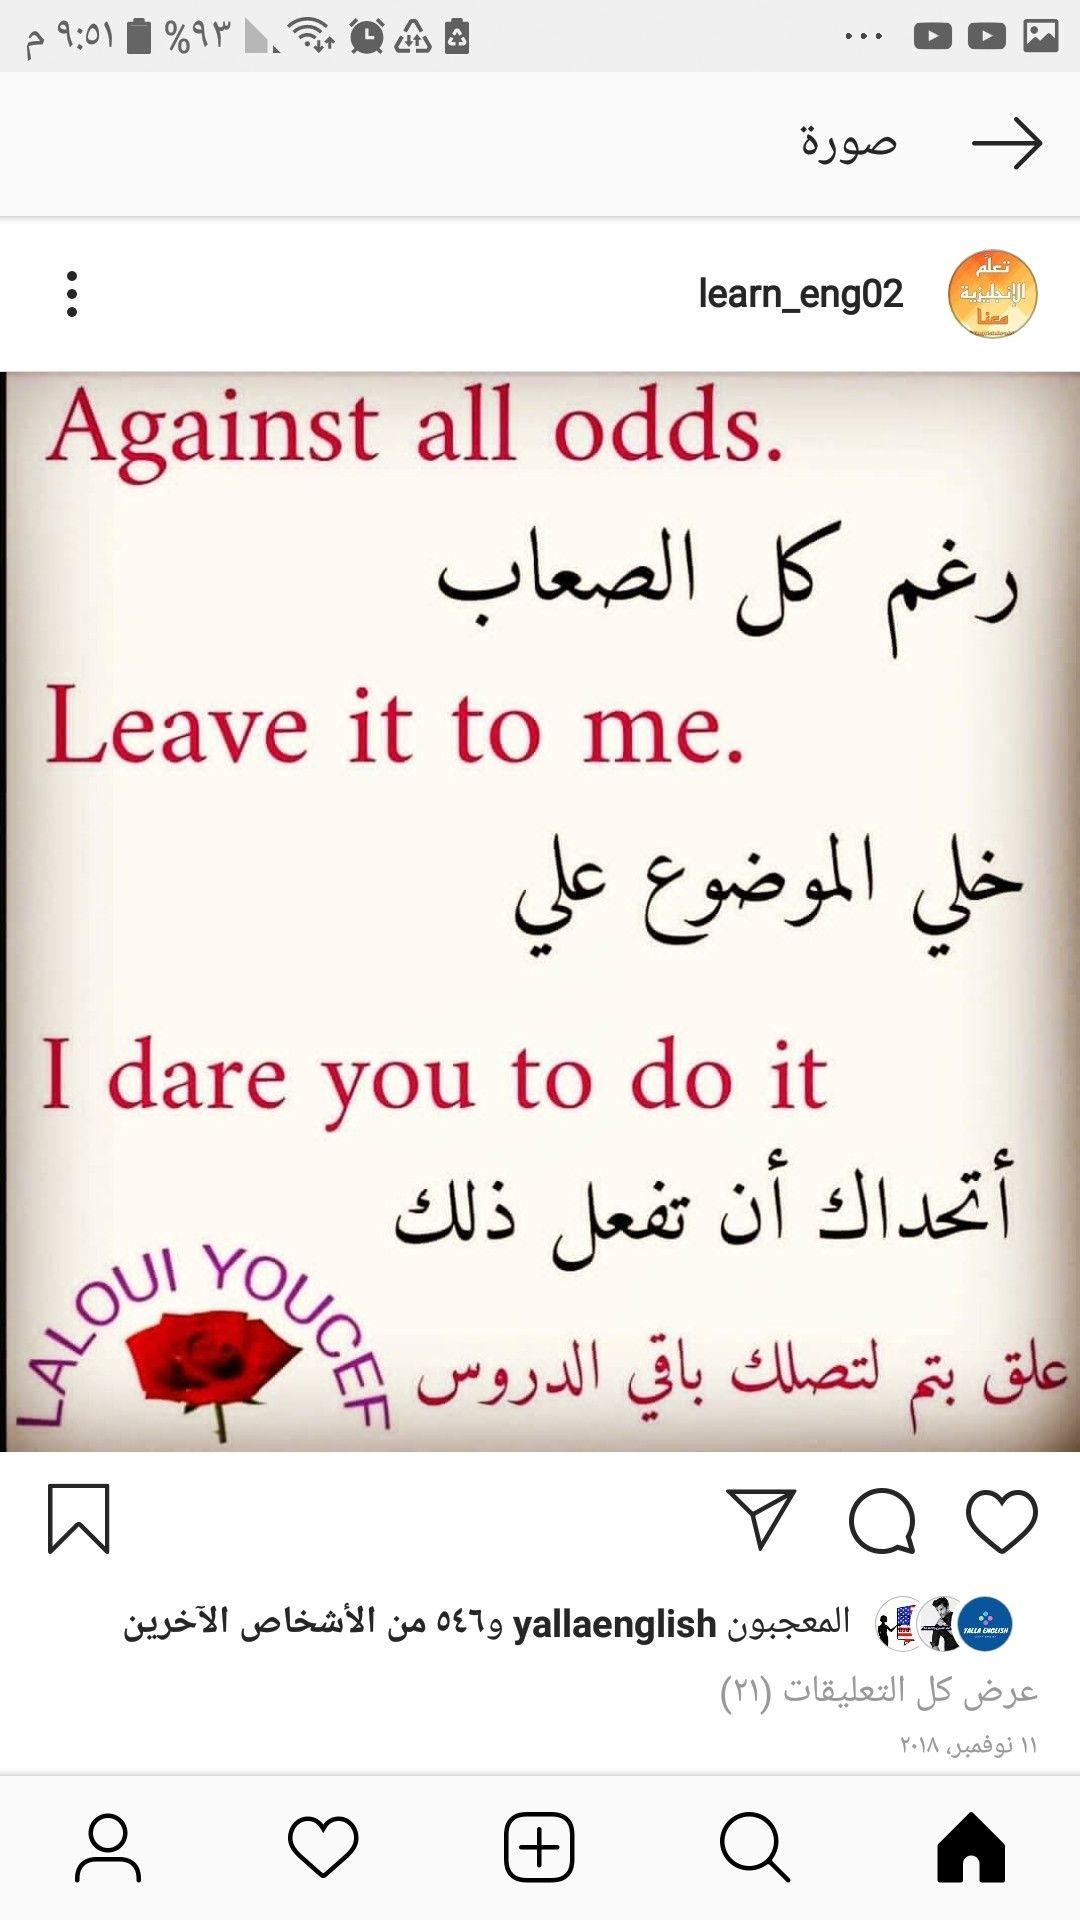 Learning Arabic Msa Fabiennem Learn English Words English Language Teaching English Phrases